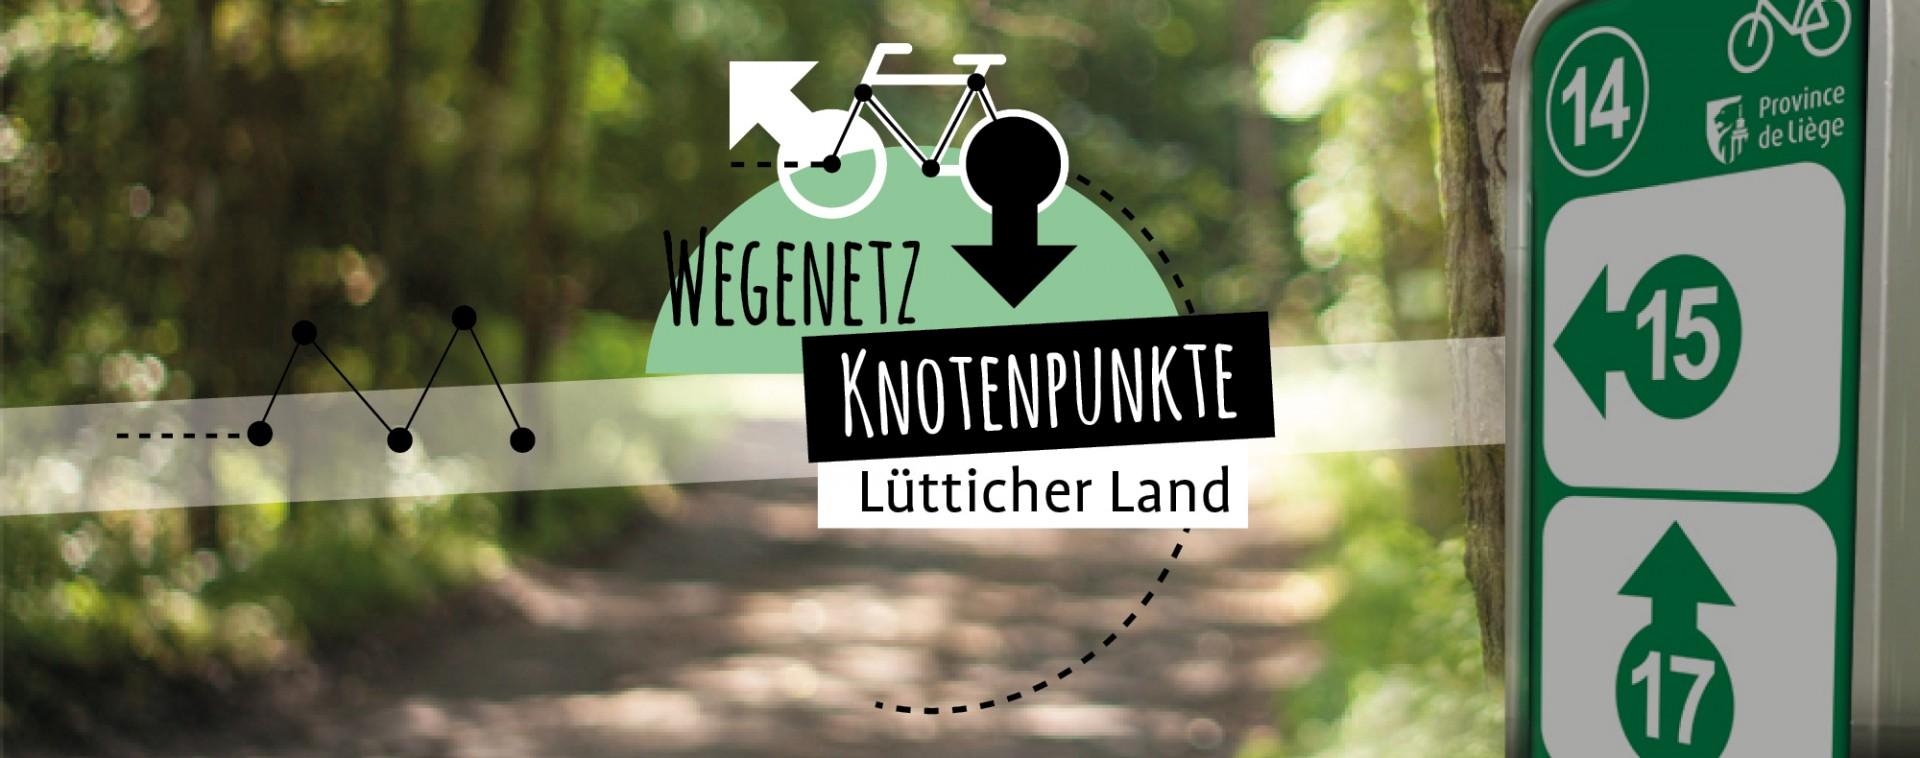 Knotenpunktsystem der Lütticher Land | © FTPL